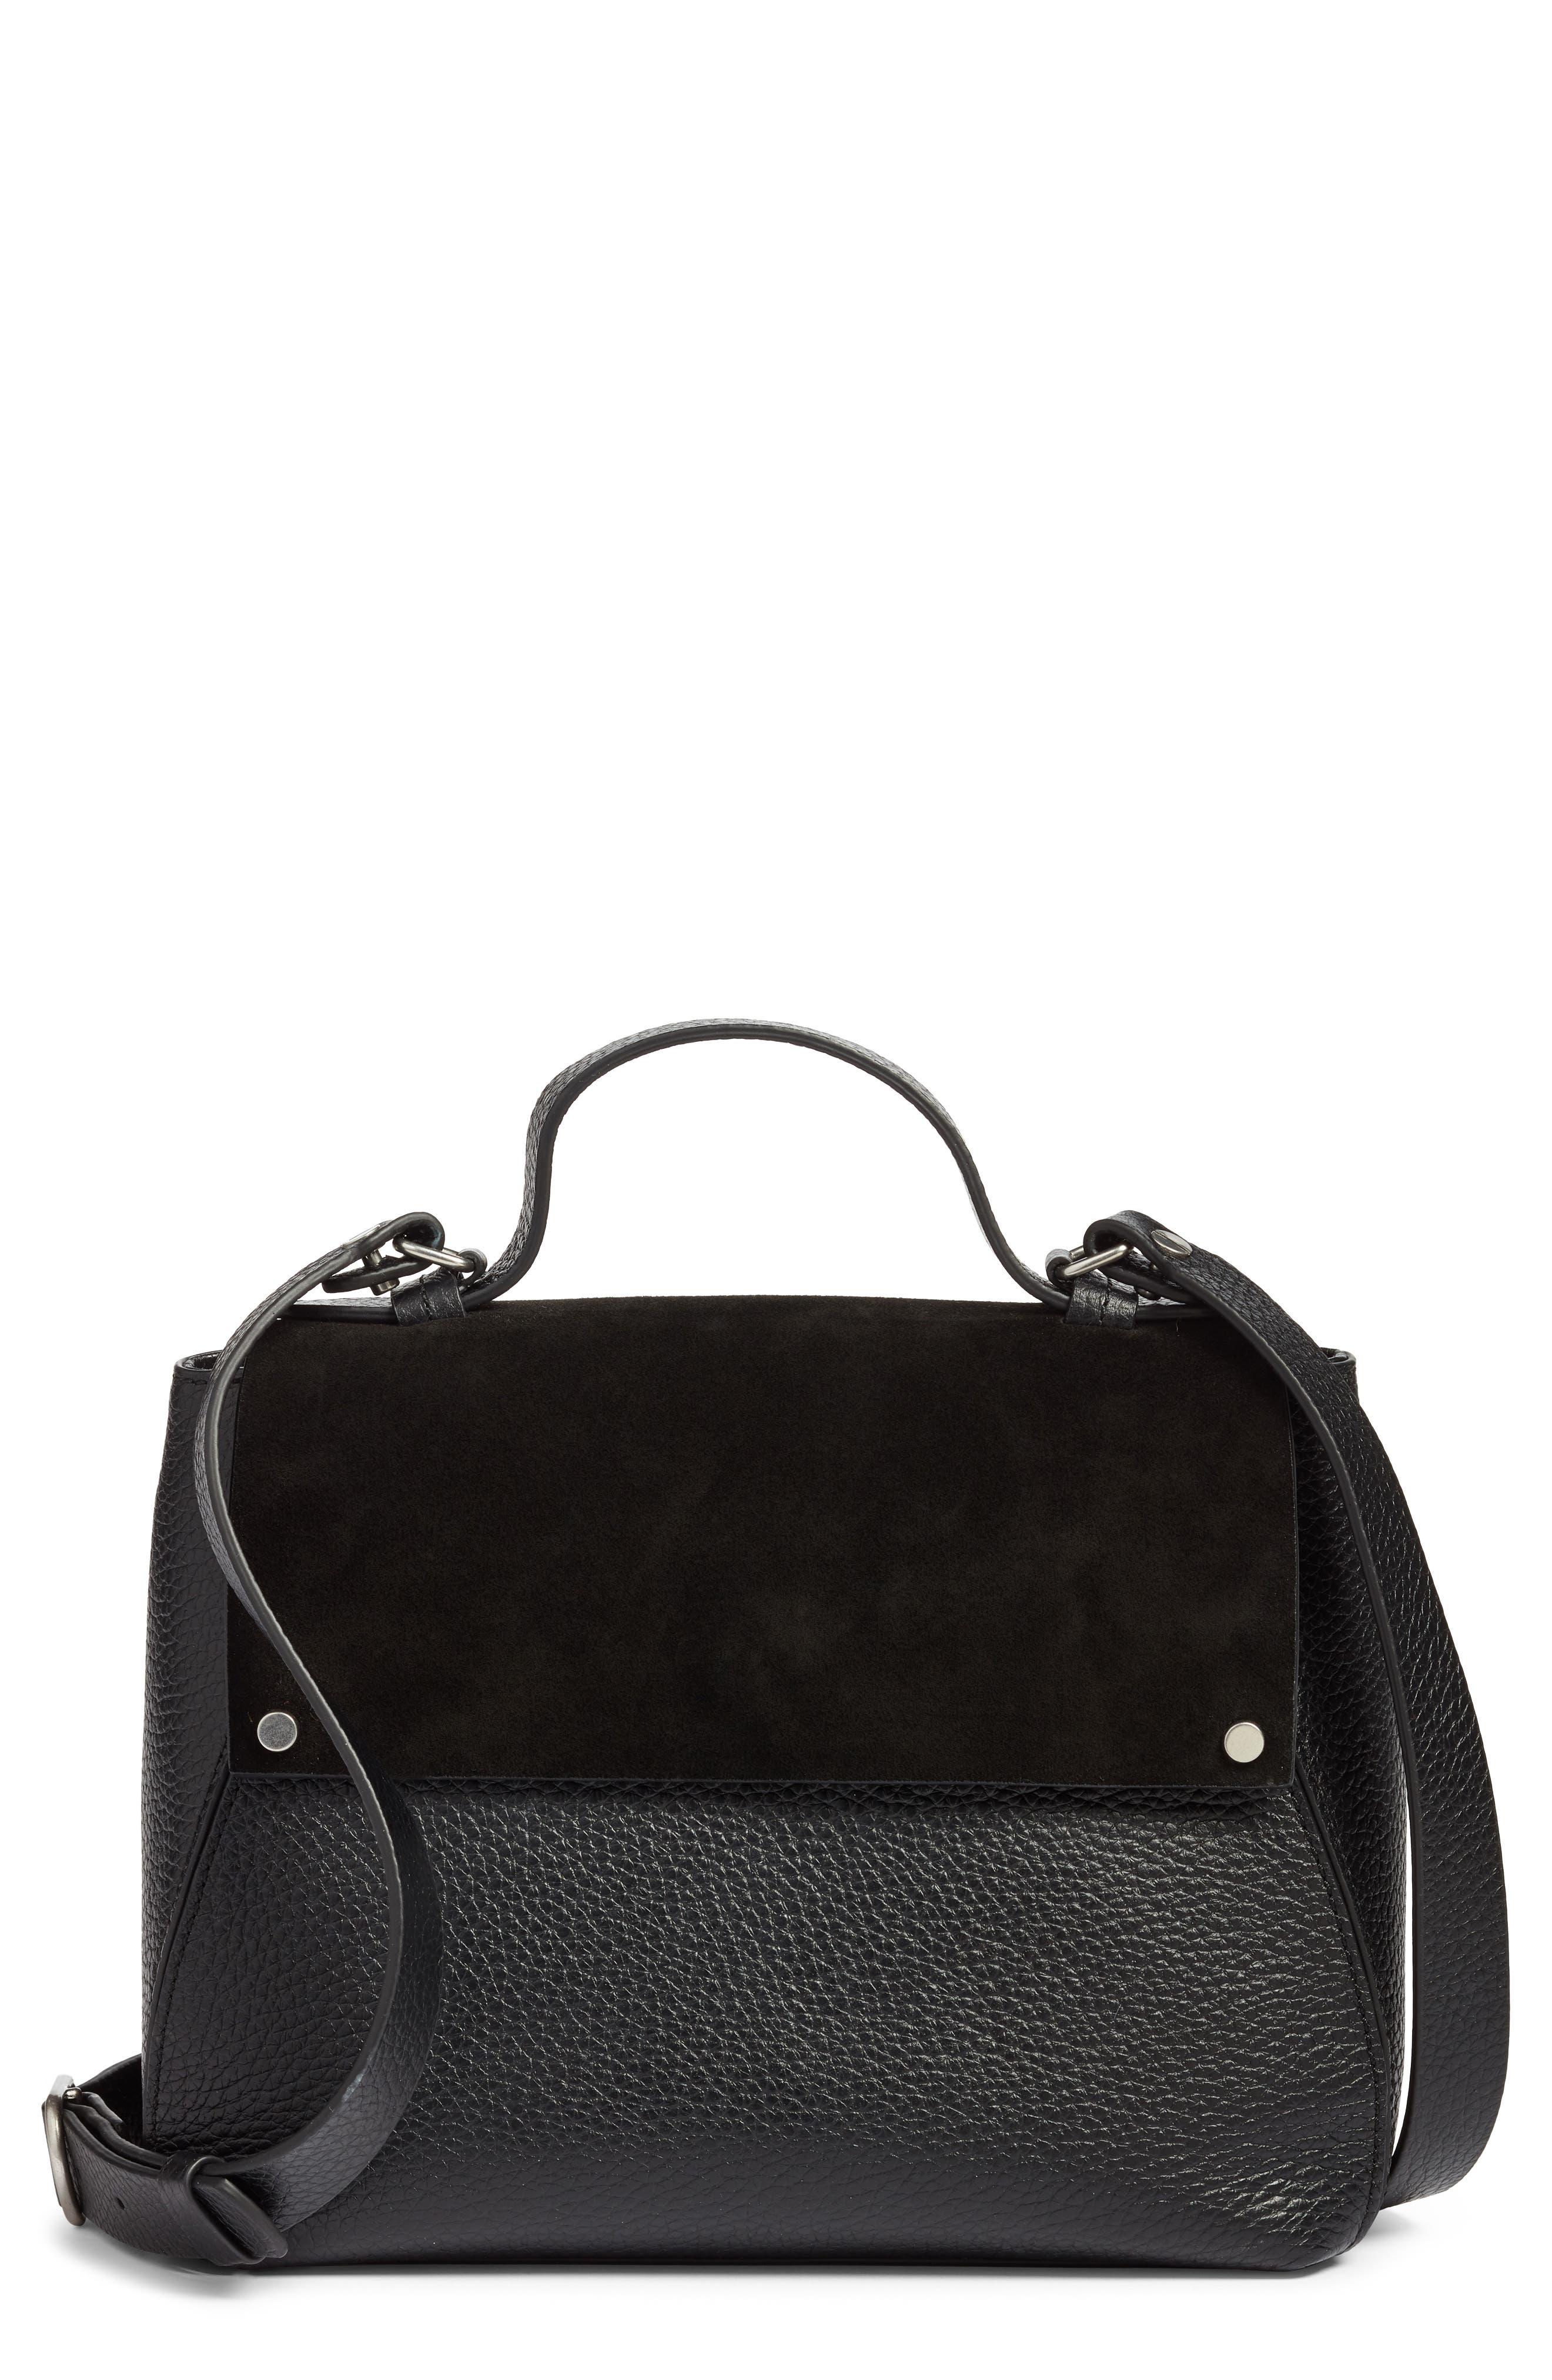 Skyler Leather Top Handle Bag,                             Main thumbnail 1, color,                             BLACK